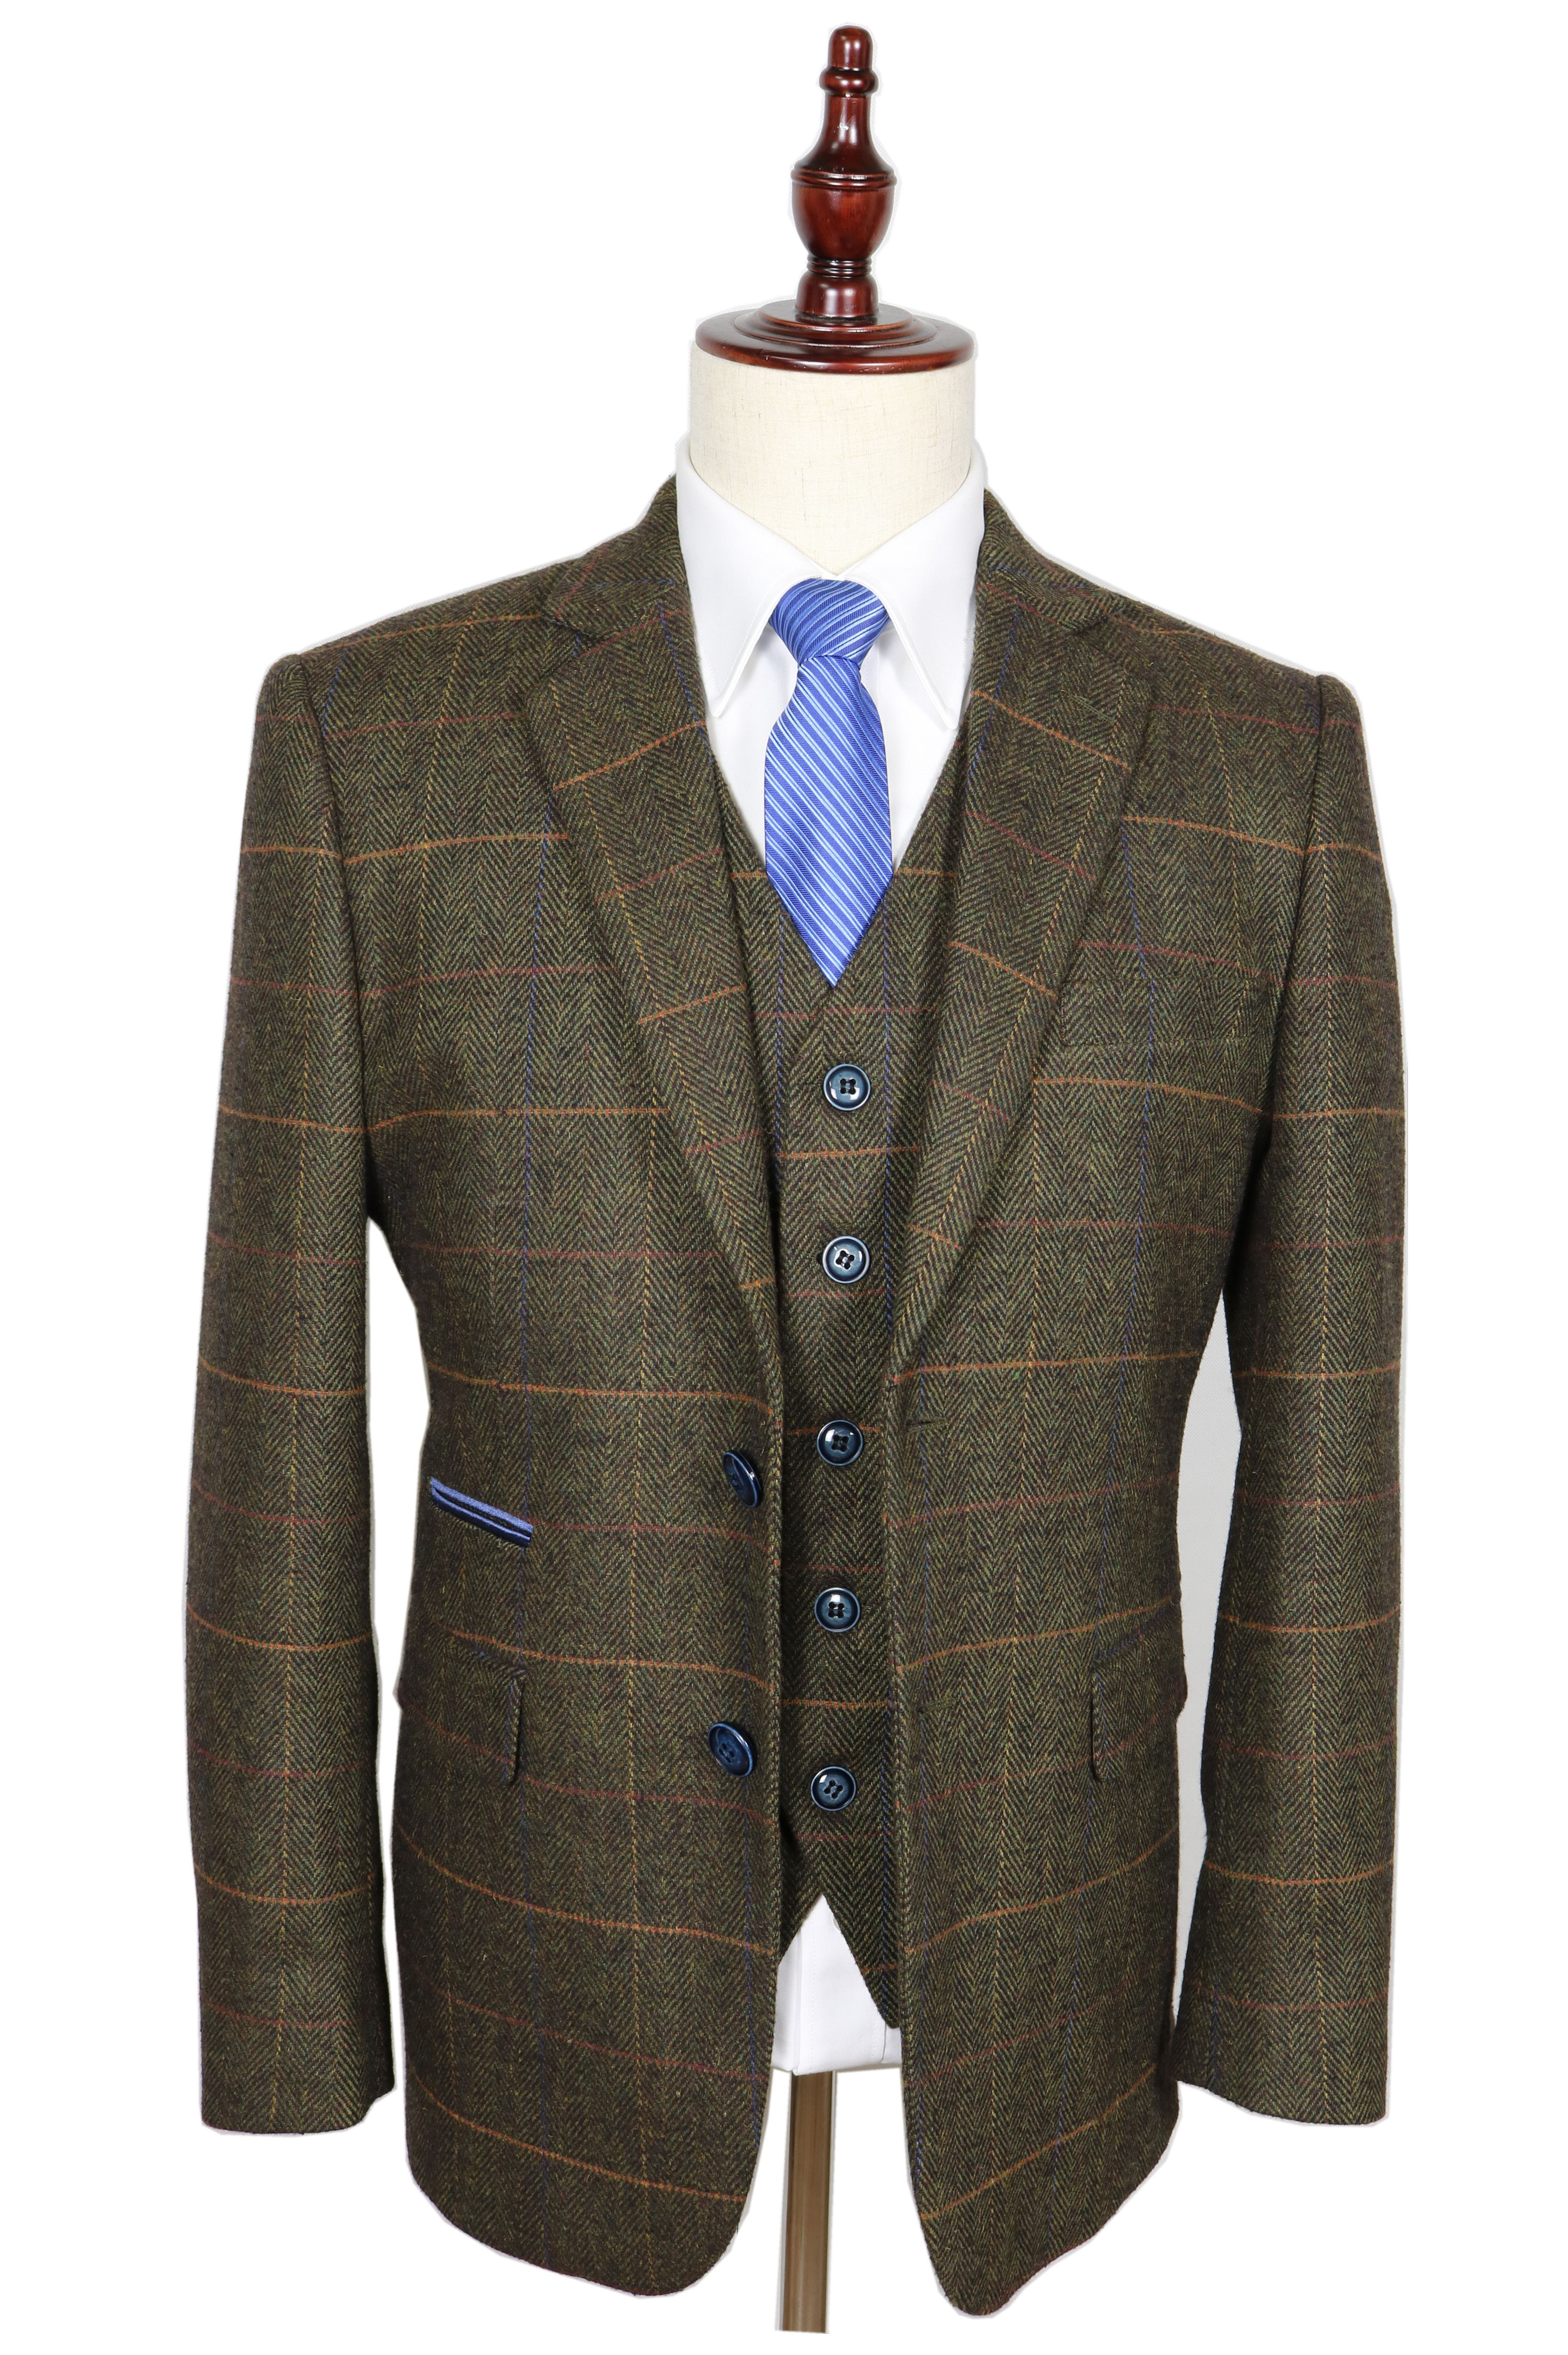 Elegant Men Suits Italy Men Suits Men Suits Wedding Luxury Vintage Slim Fit Suits For Men Wool Brown Checkered Tweed Mens Suits Slim Fit Suits Mens Suit Jacket